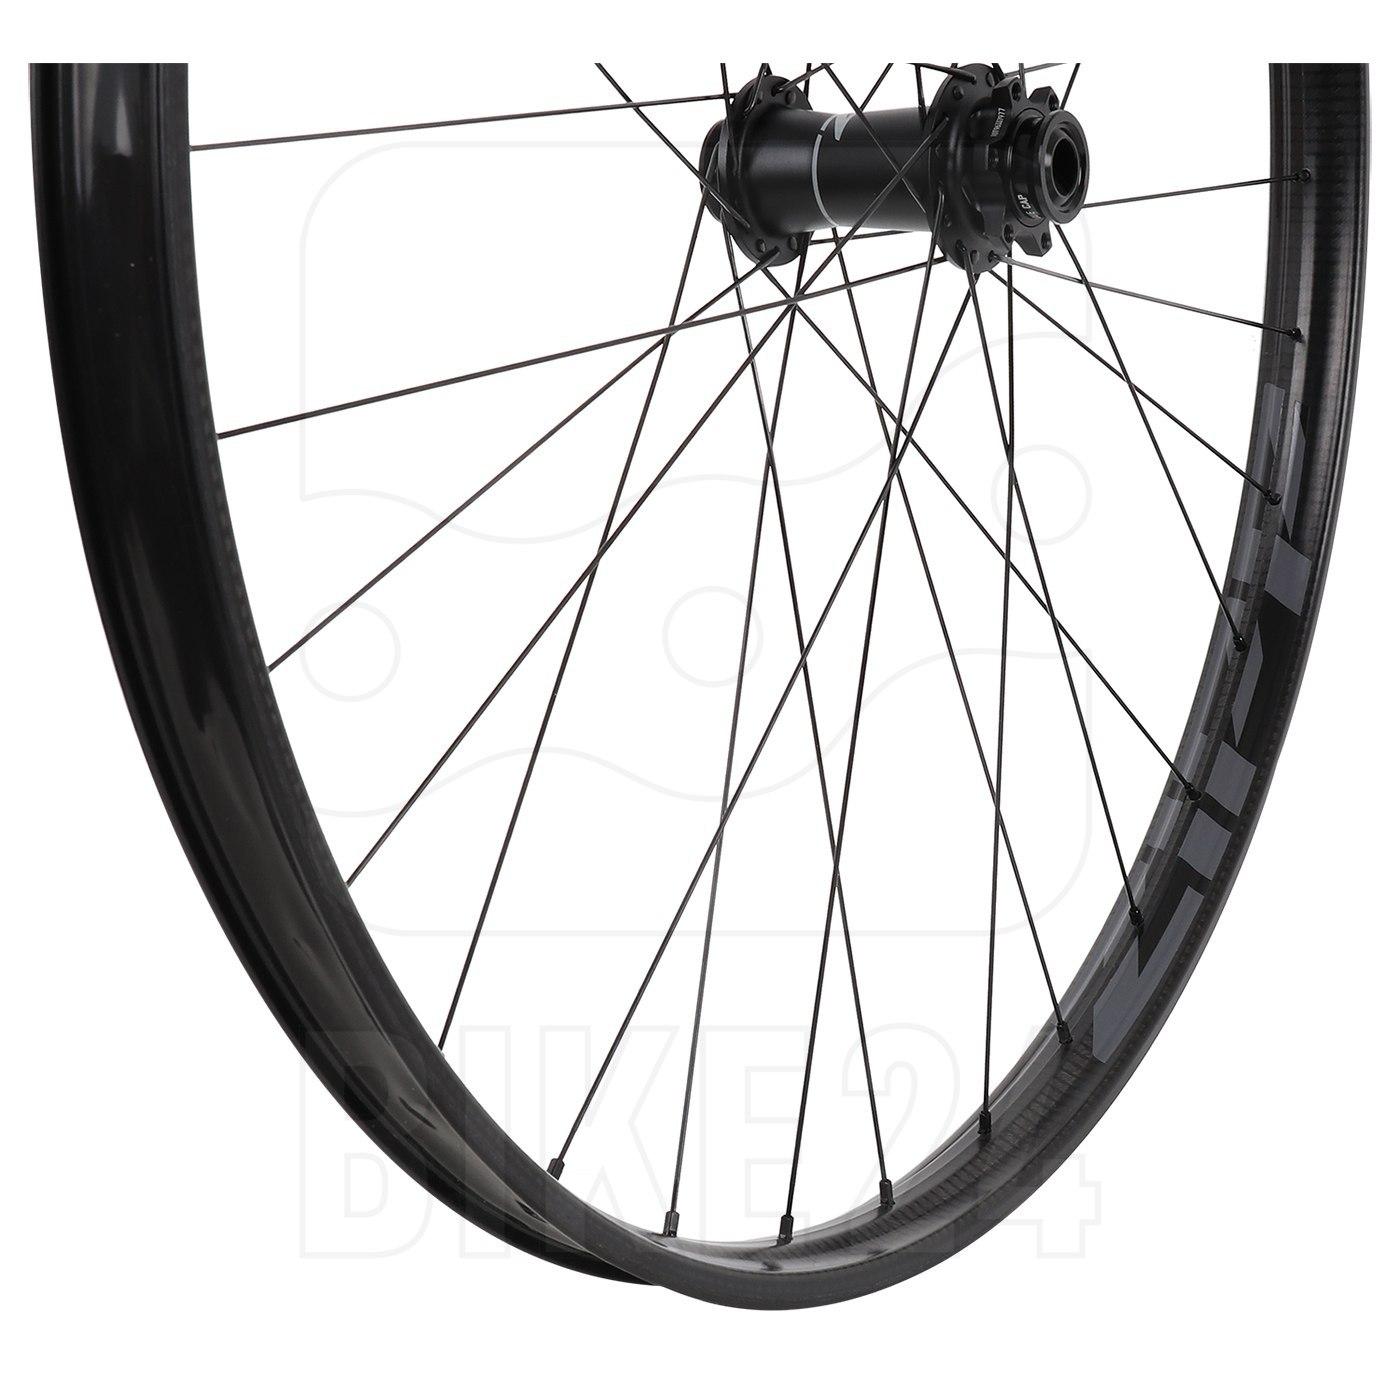 Image of ZIPP 3ZERO MOTO 27.5 Inch Carbon Rear Wheel - 6-Bolt - XD-Freehub - 12x148mm Boost - Slate / Stealth